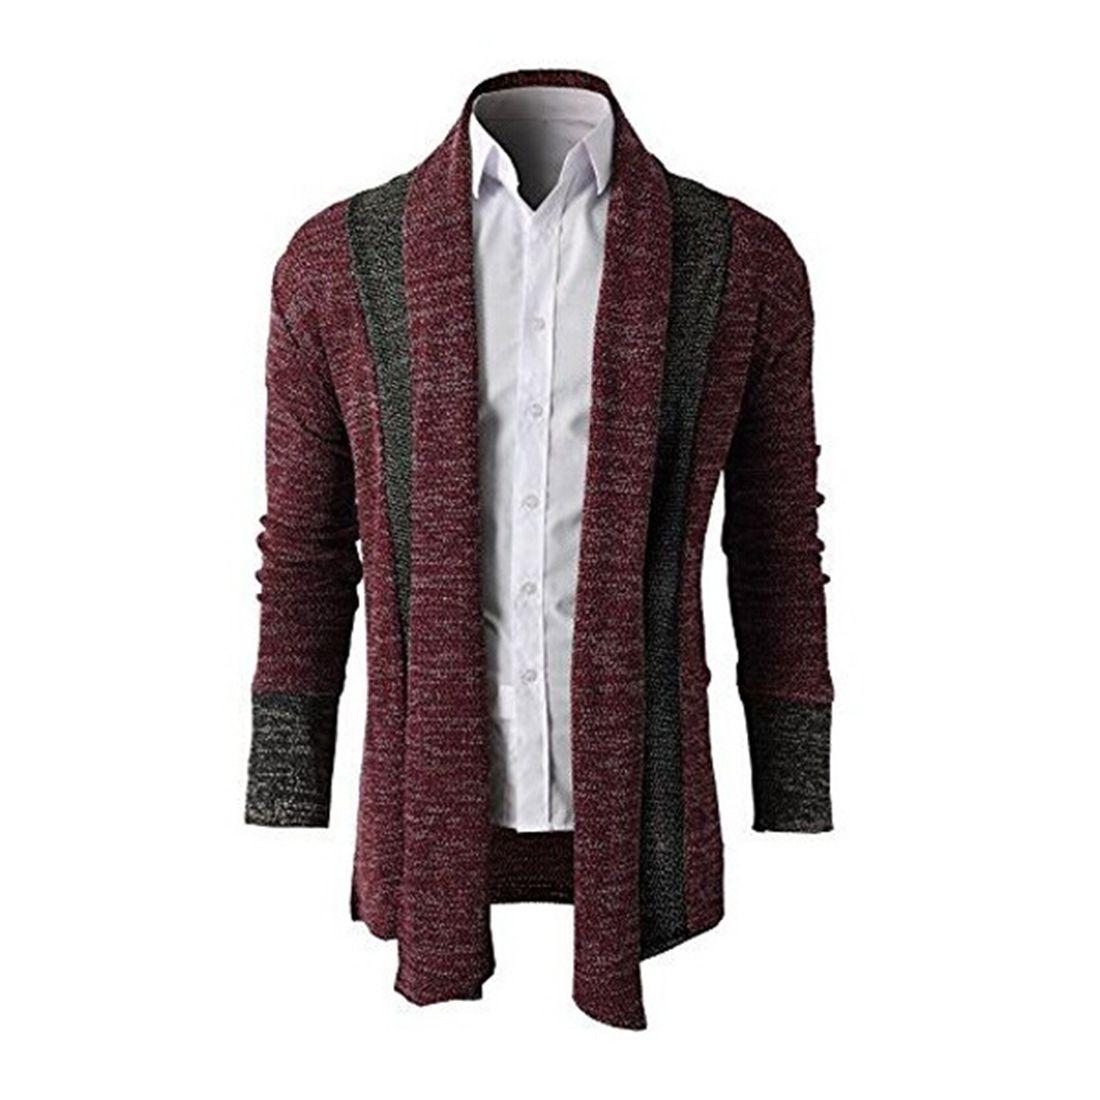 M-2XL Knitting Cardigans Coats Men Patchwork Red Gray Outwear 2017 ...